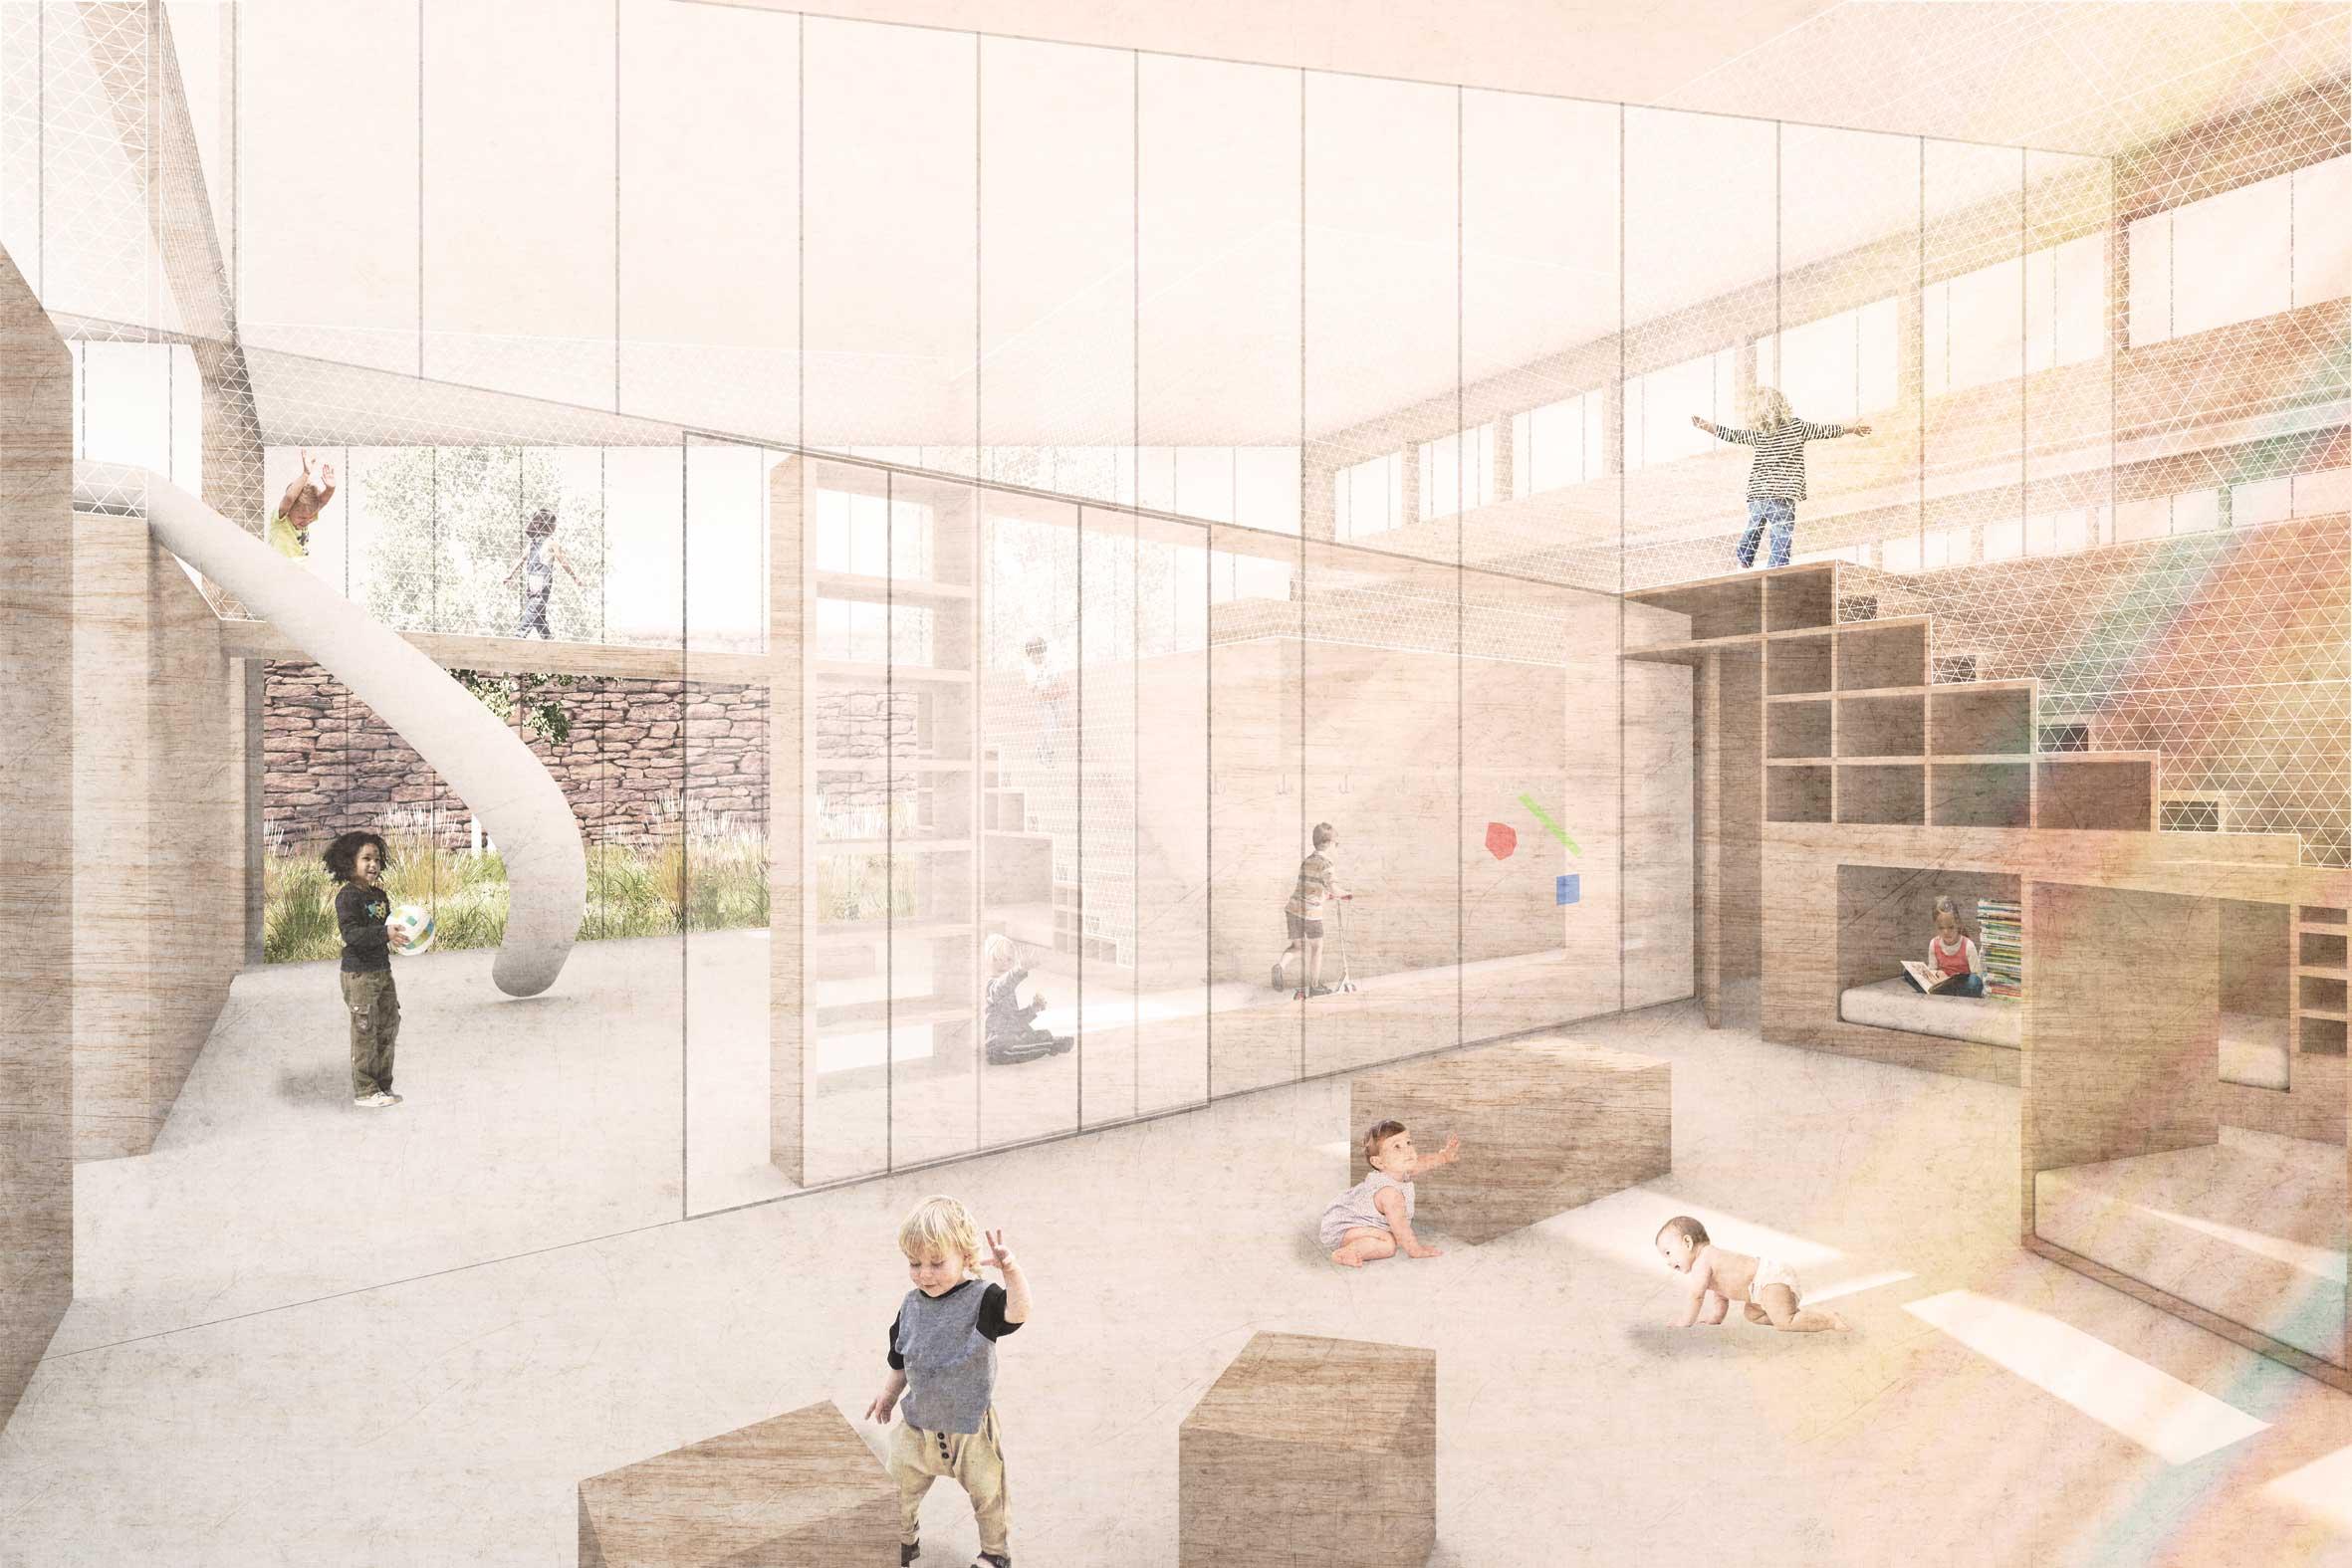 STUDIOKUBIK-KUBIK-architektur-architecture-berlin-KFM-perspektive